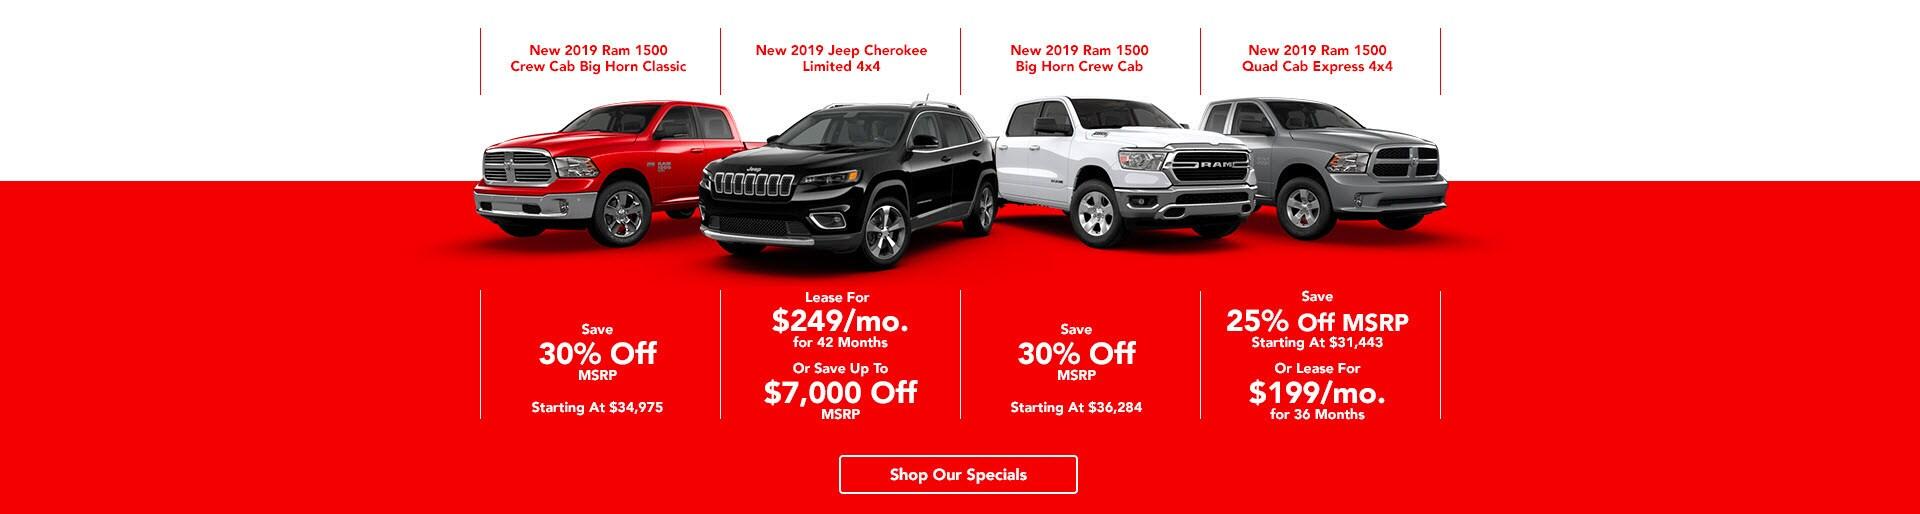 Baxter Auto Omaha >> Baxter Chrysler Dodge Jeep Ram | Jeep Sales & Service in ...